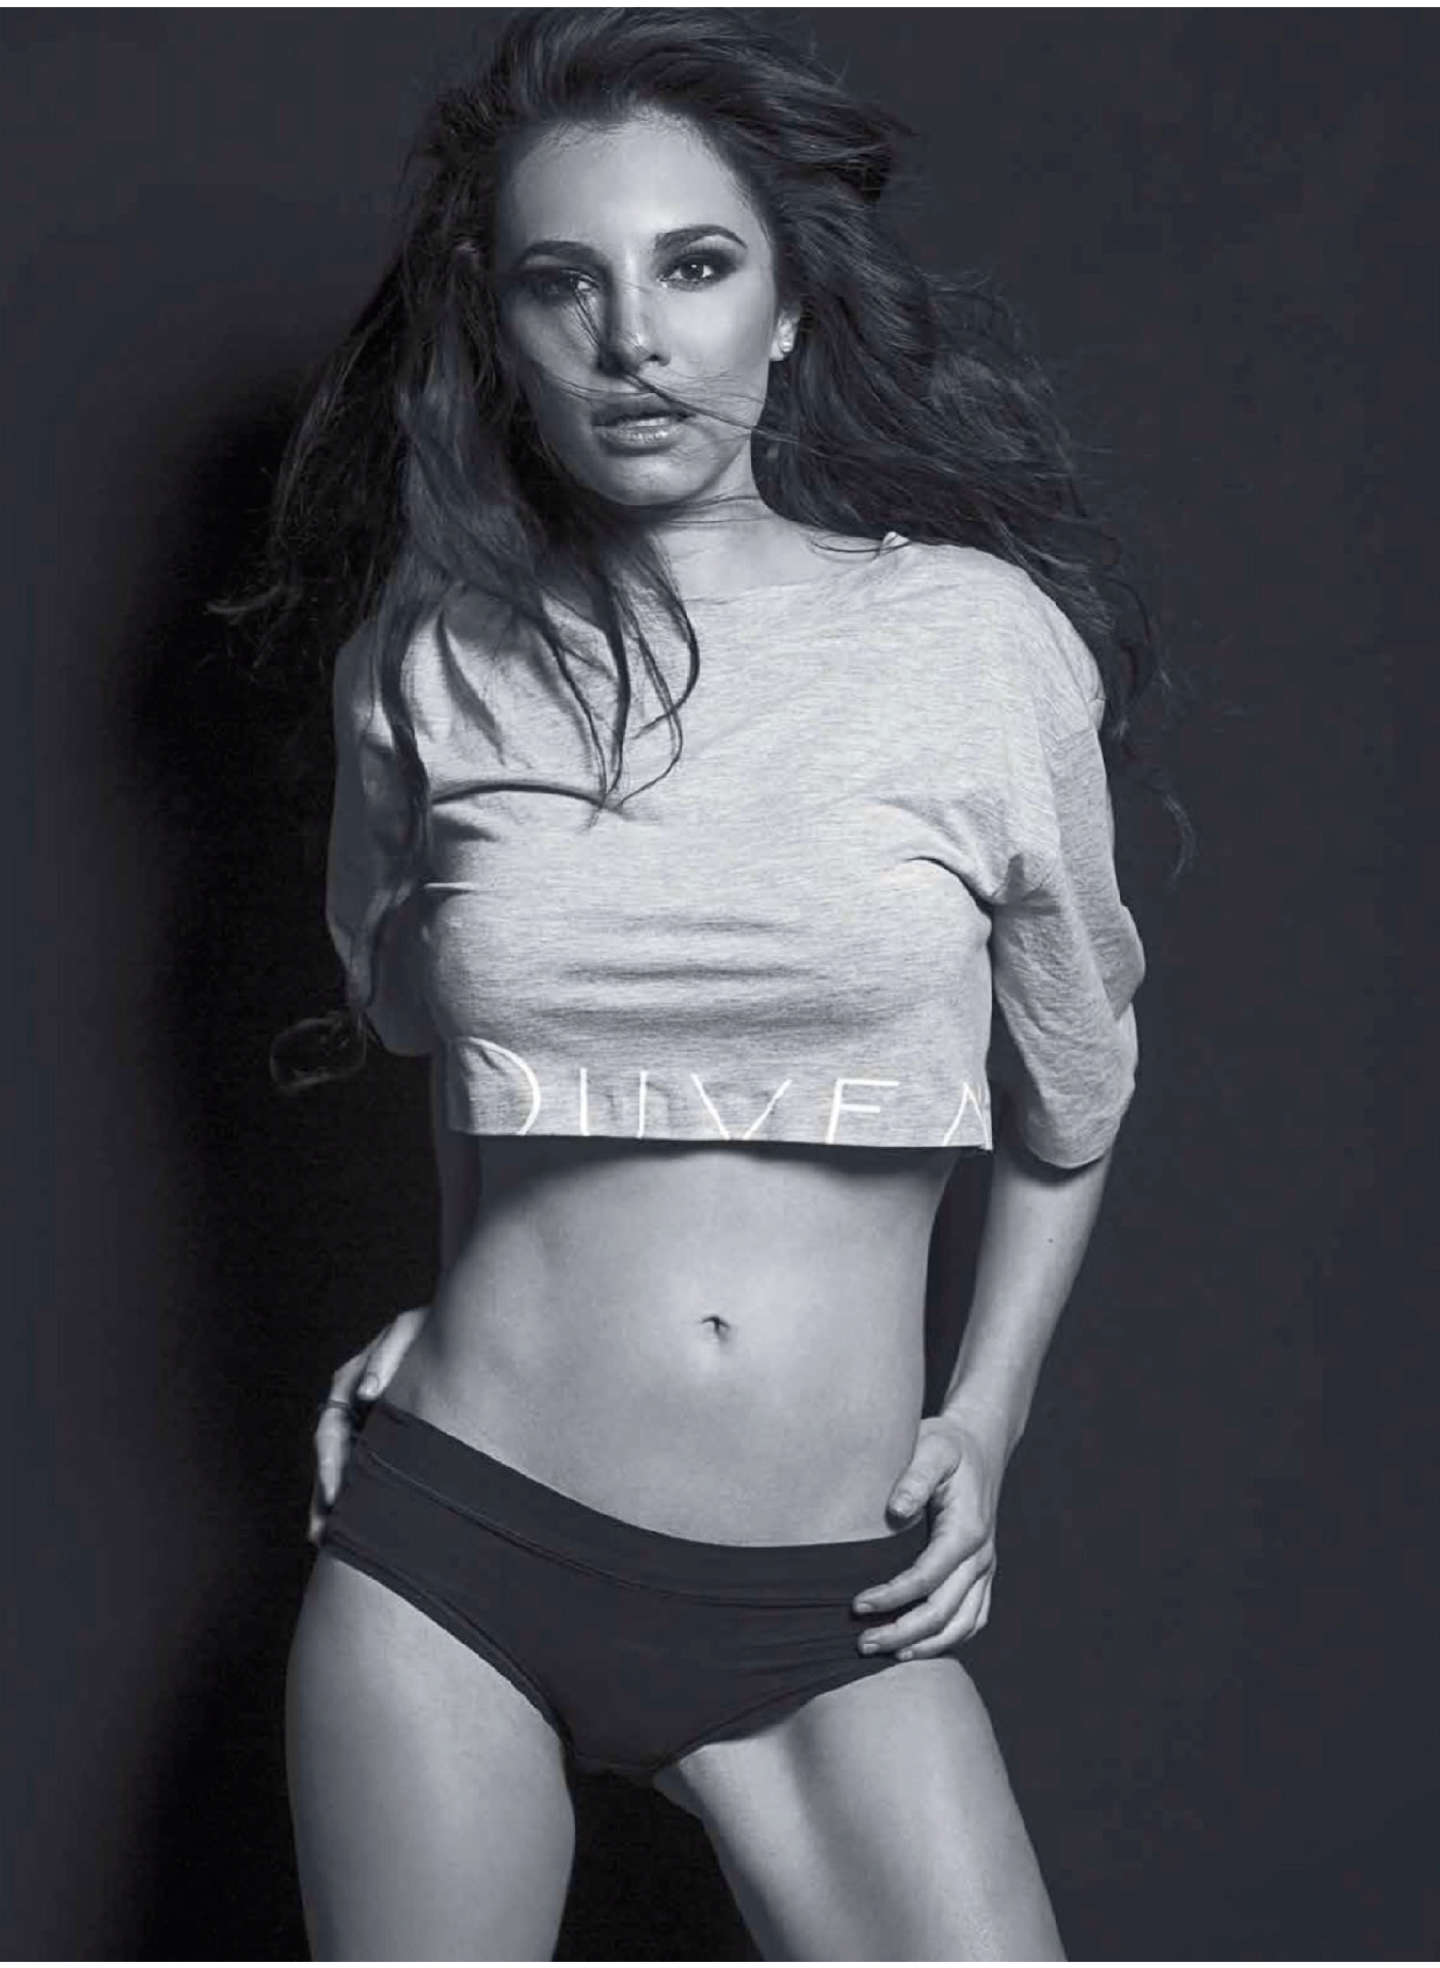 Leaked Martha Higareda nudes (19 photos), Topless, Sideboobs, Boobs, braless 2006